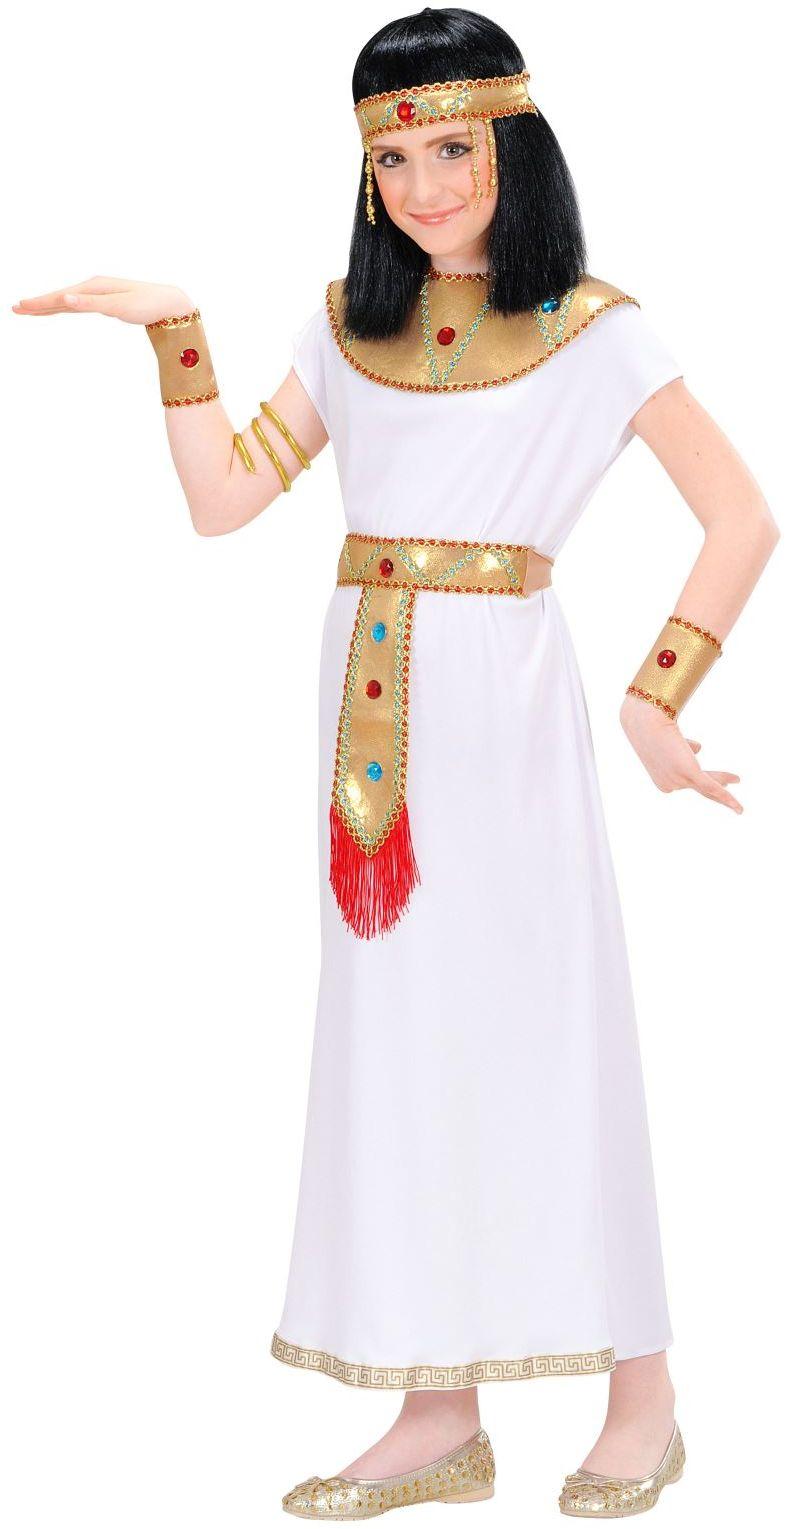 Egyptische prinses kind